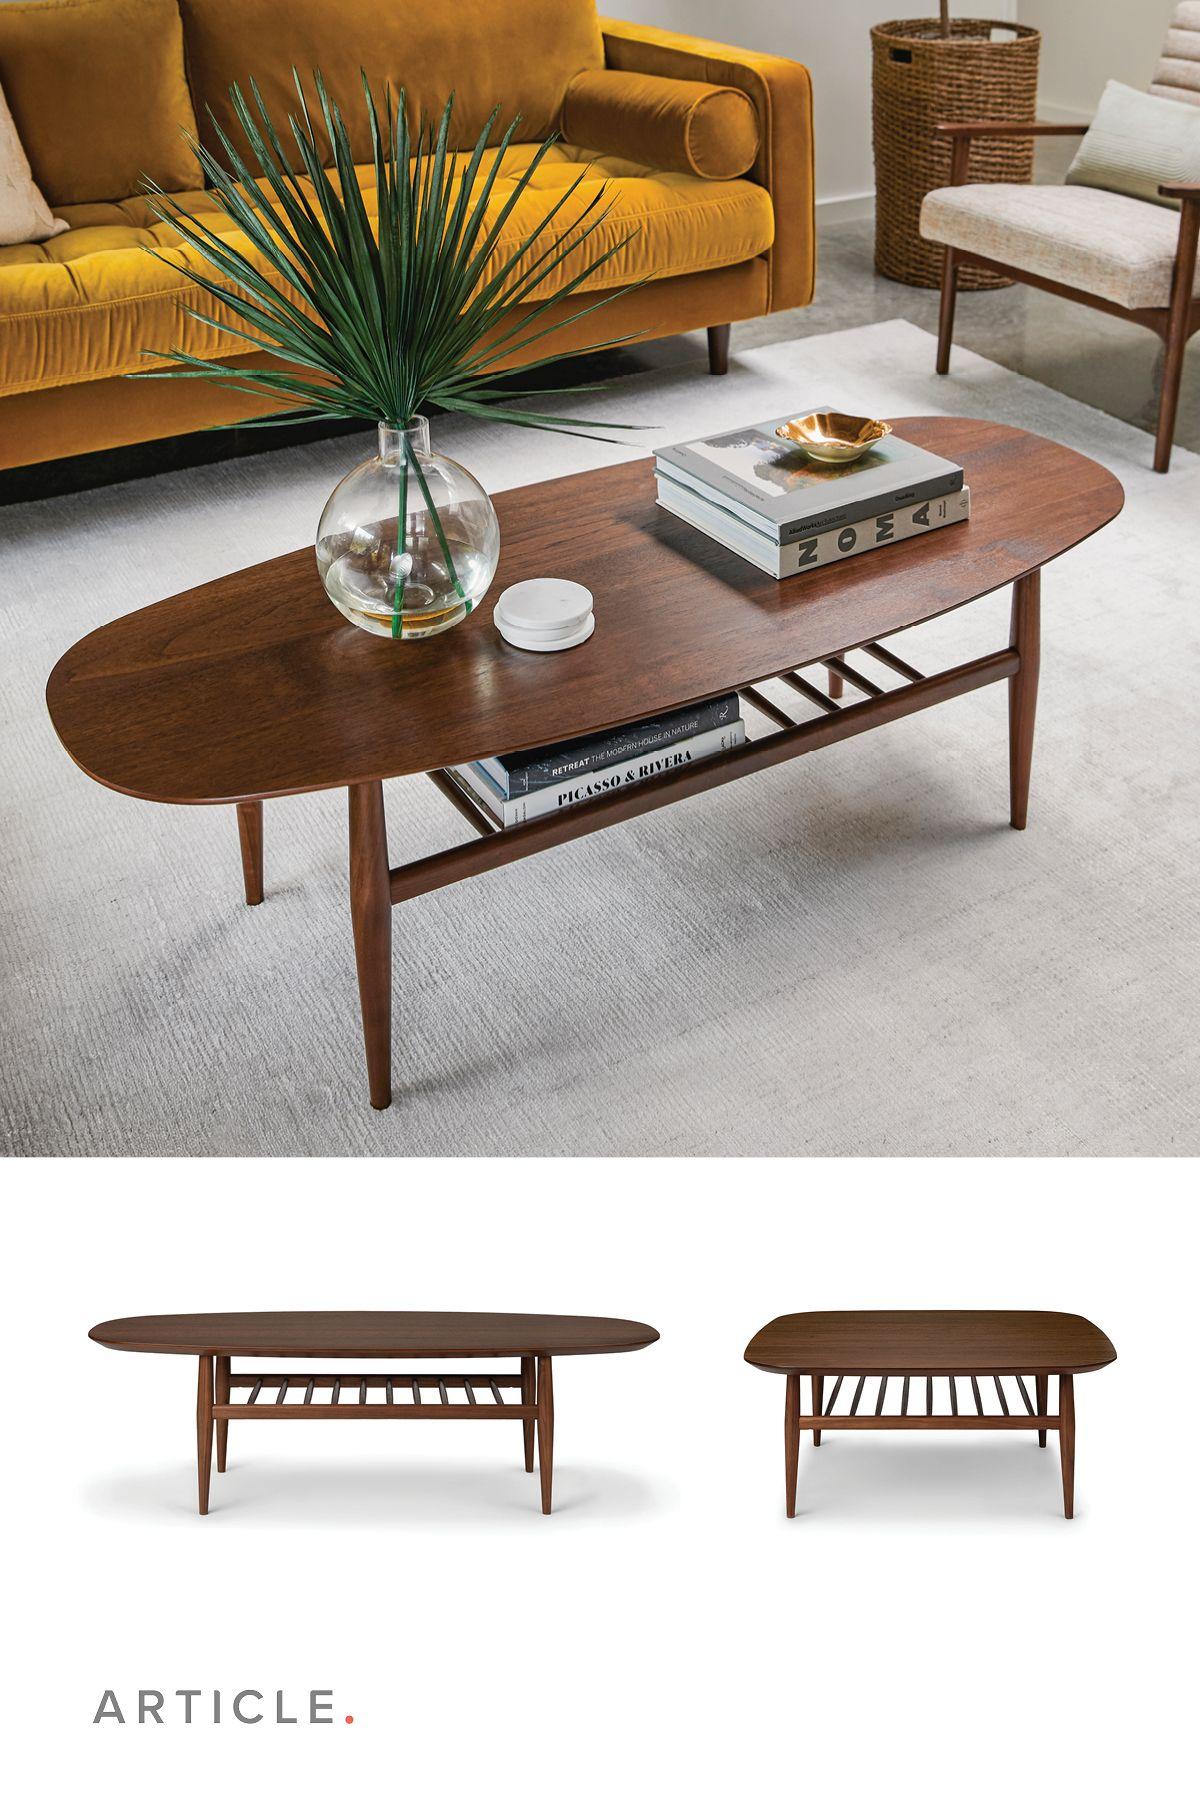 Lenia Walnut Oval Coffee Table Coffee Table Books Decor Coffee Table Coffee Table With Shelf [ 1800 x 1200 Pixel ]